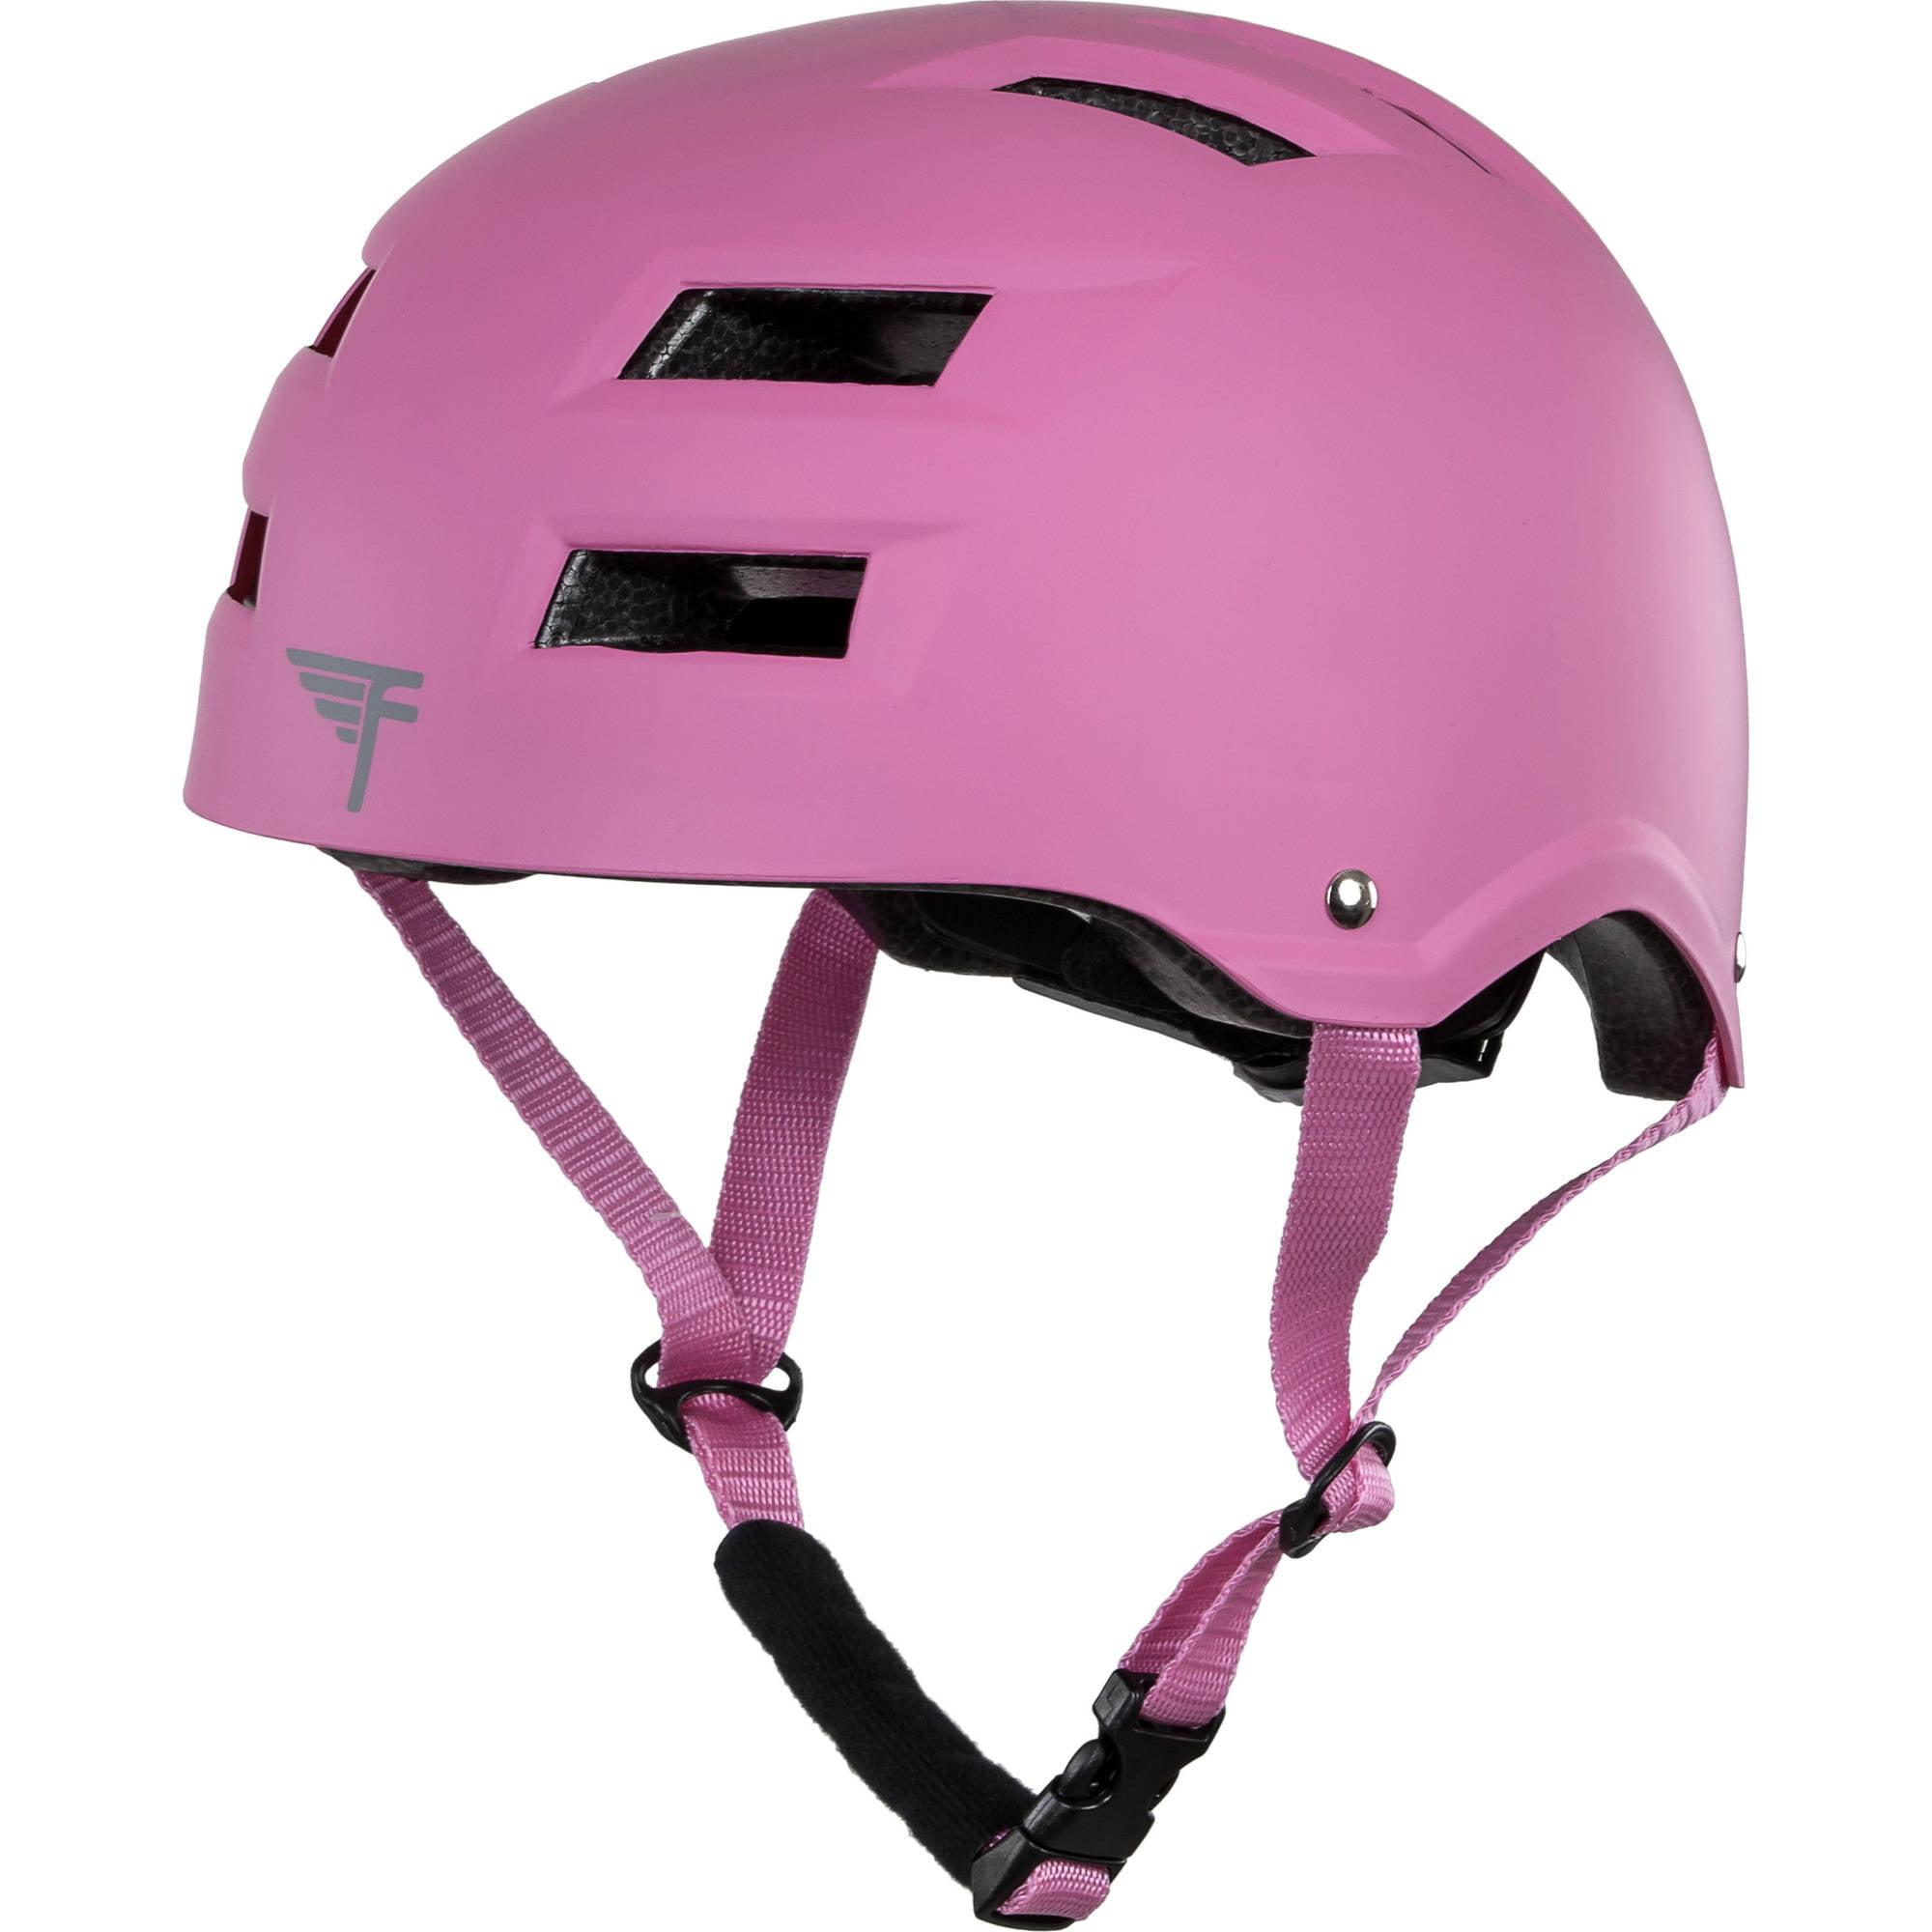 Flybar Multi Sport Helmet, Pink, L XL by Flybar